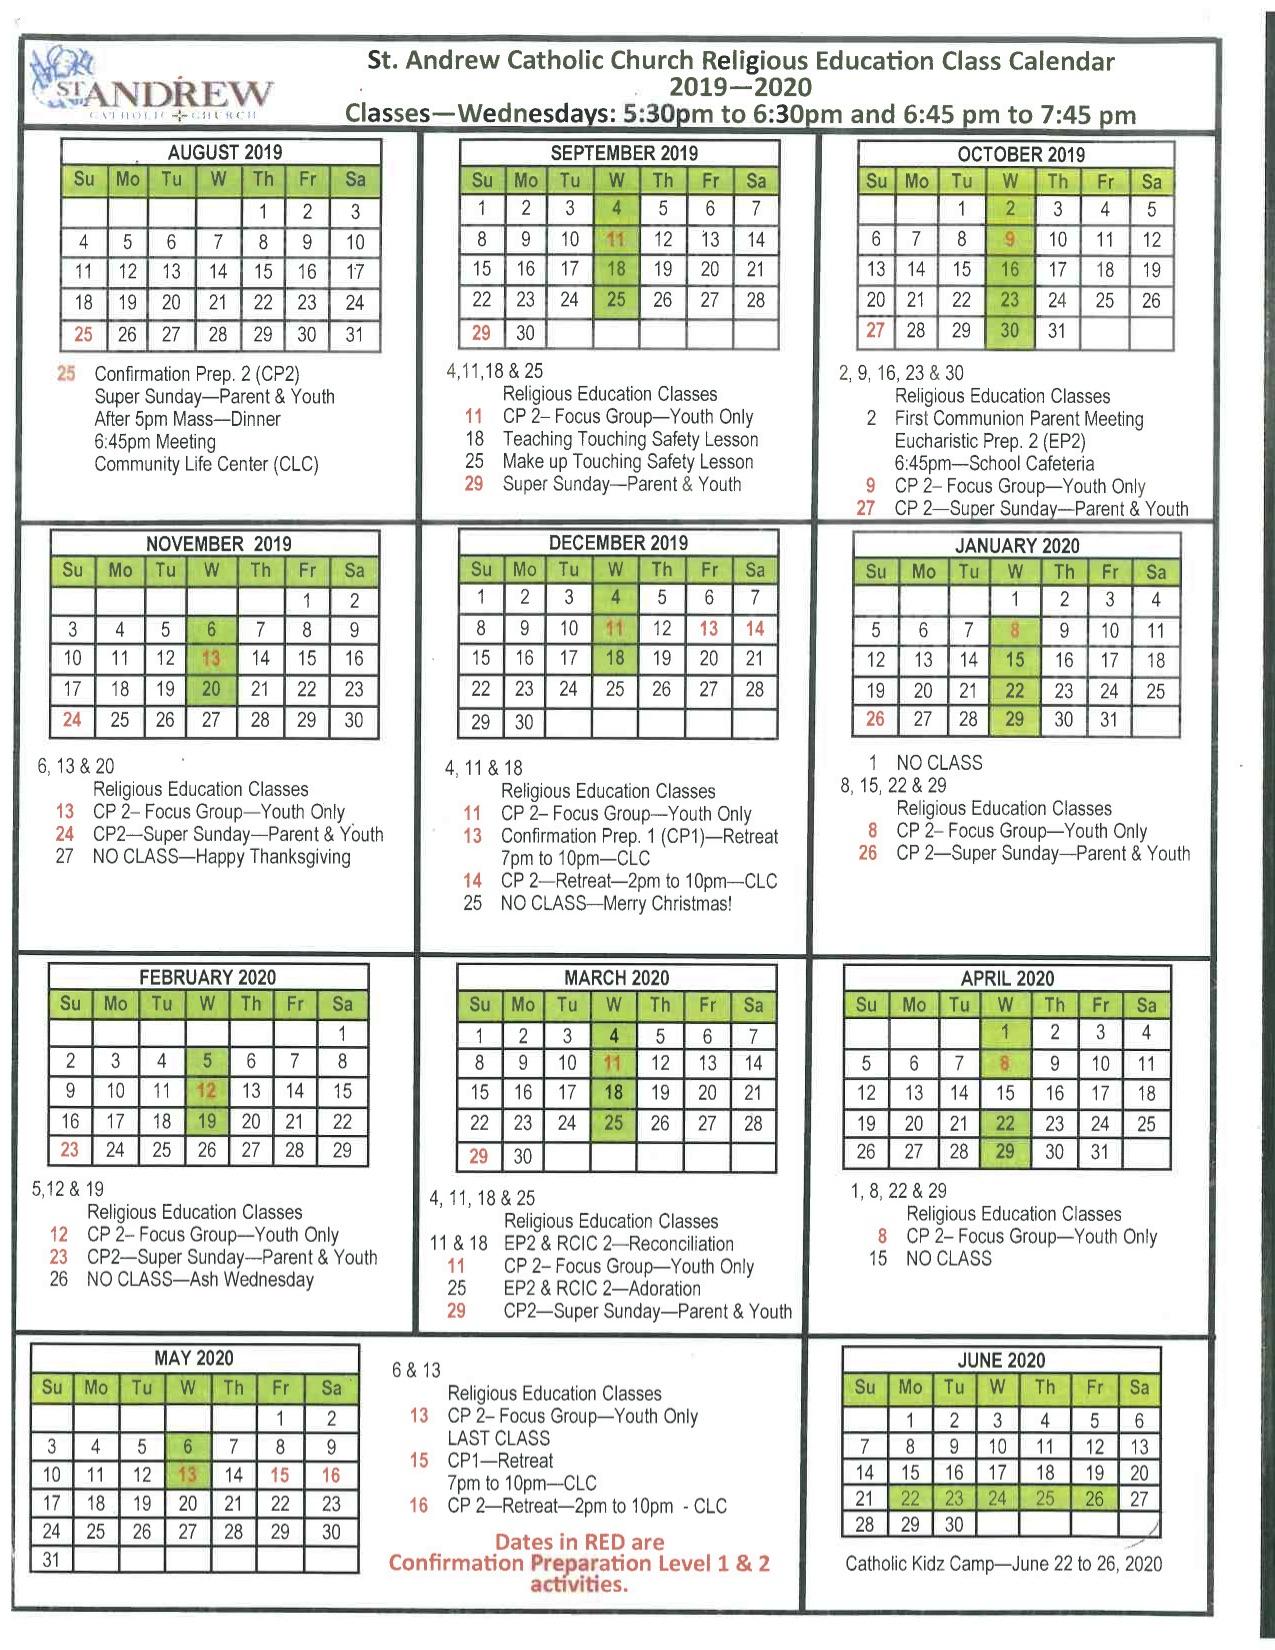 Liturgical Calendar - St. Andrew Catholic School